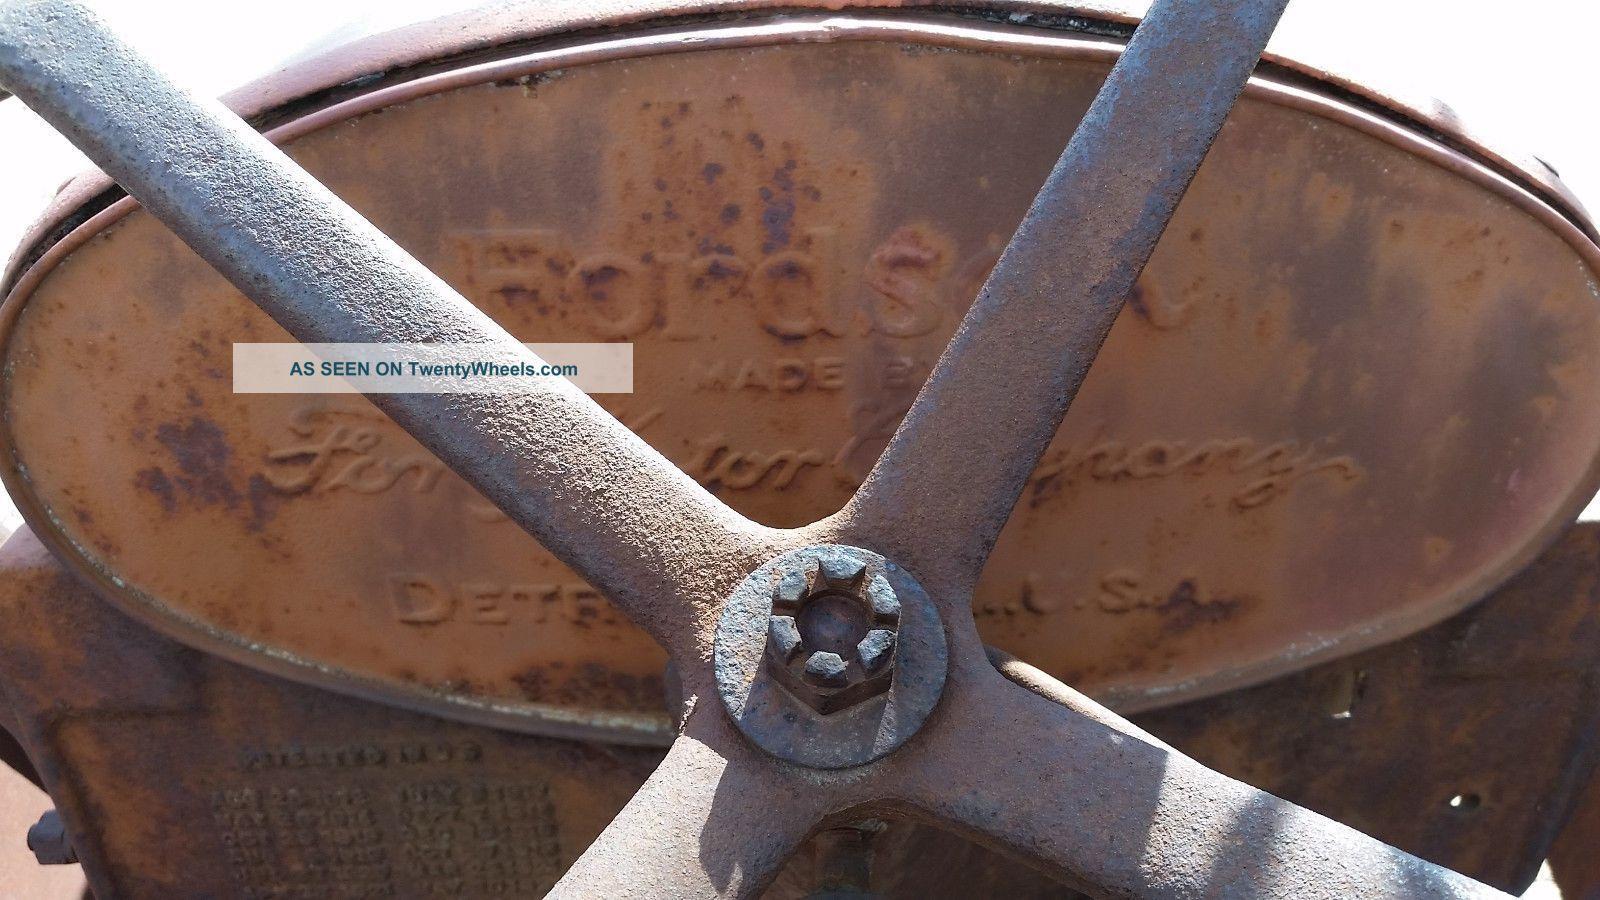 Antique Tractor Steel Wheels : Antique vintage tractor fordson steel wheel